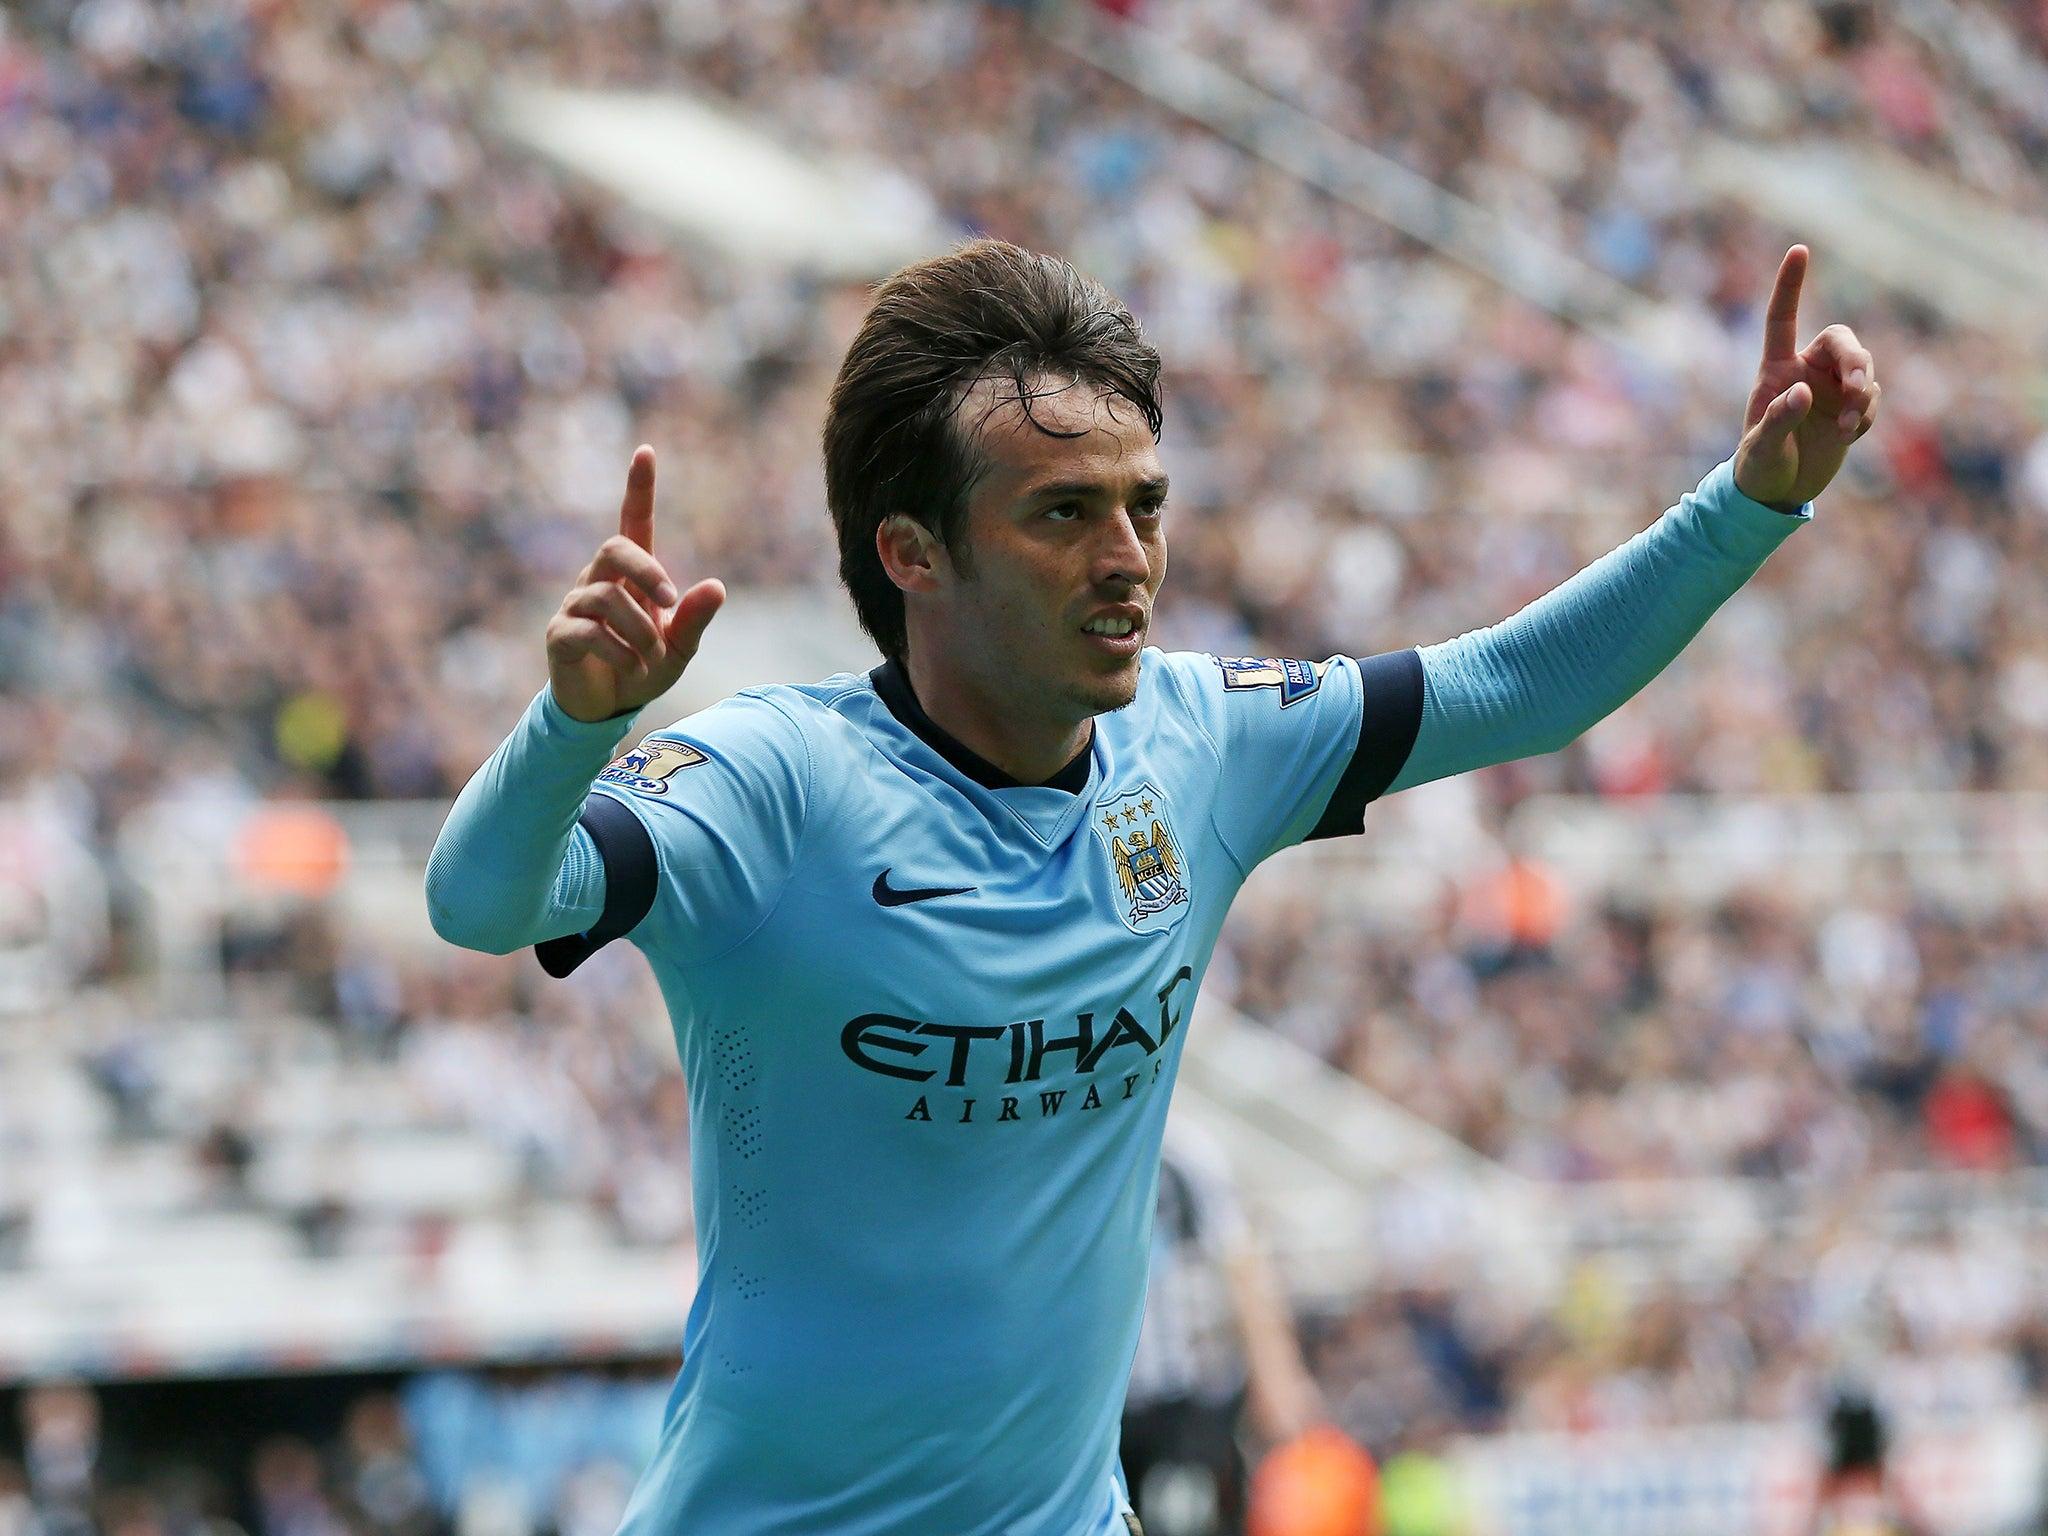 Newcastle United vs Manchester City match report David Silva and